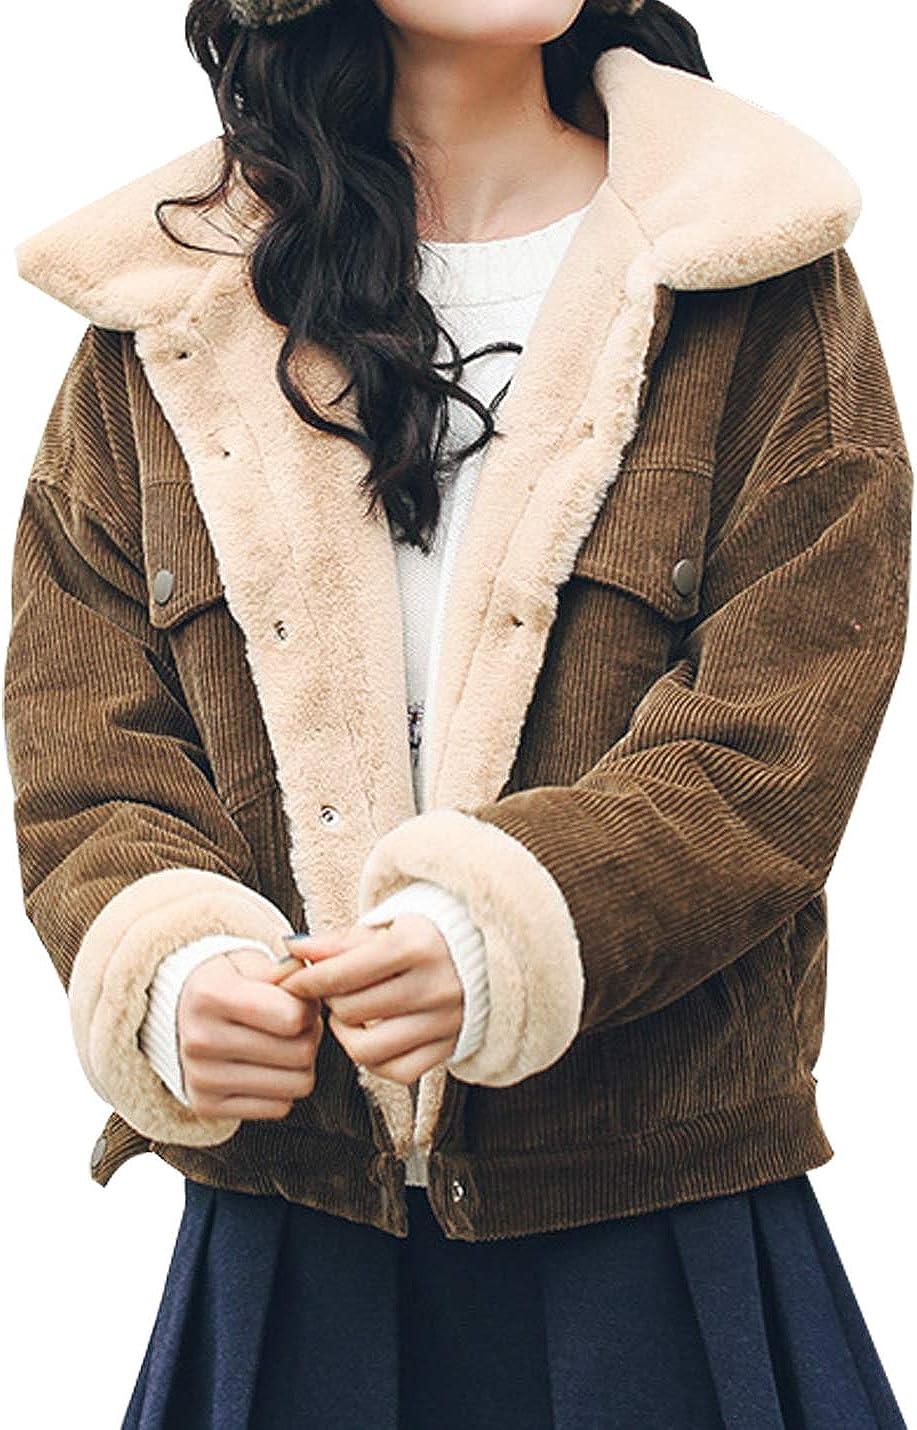 Tanming Womens Casual Warm Corduroy Sherpa Lined Button Up Short Trucker Jacket Coat